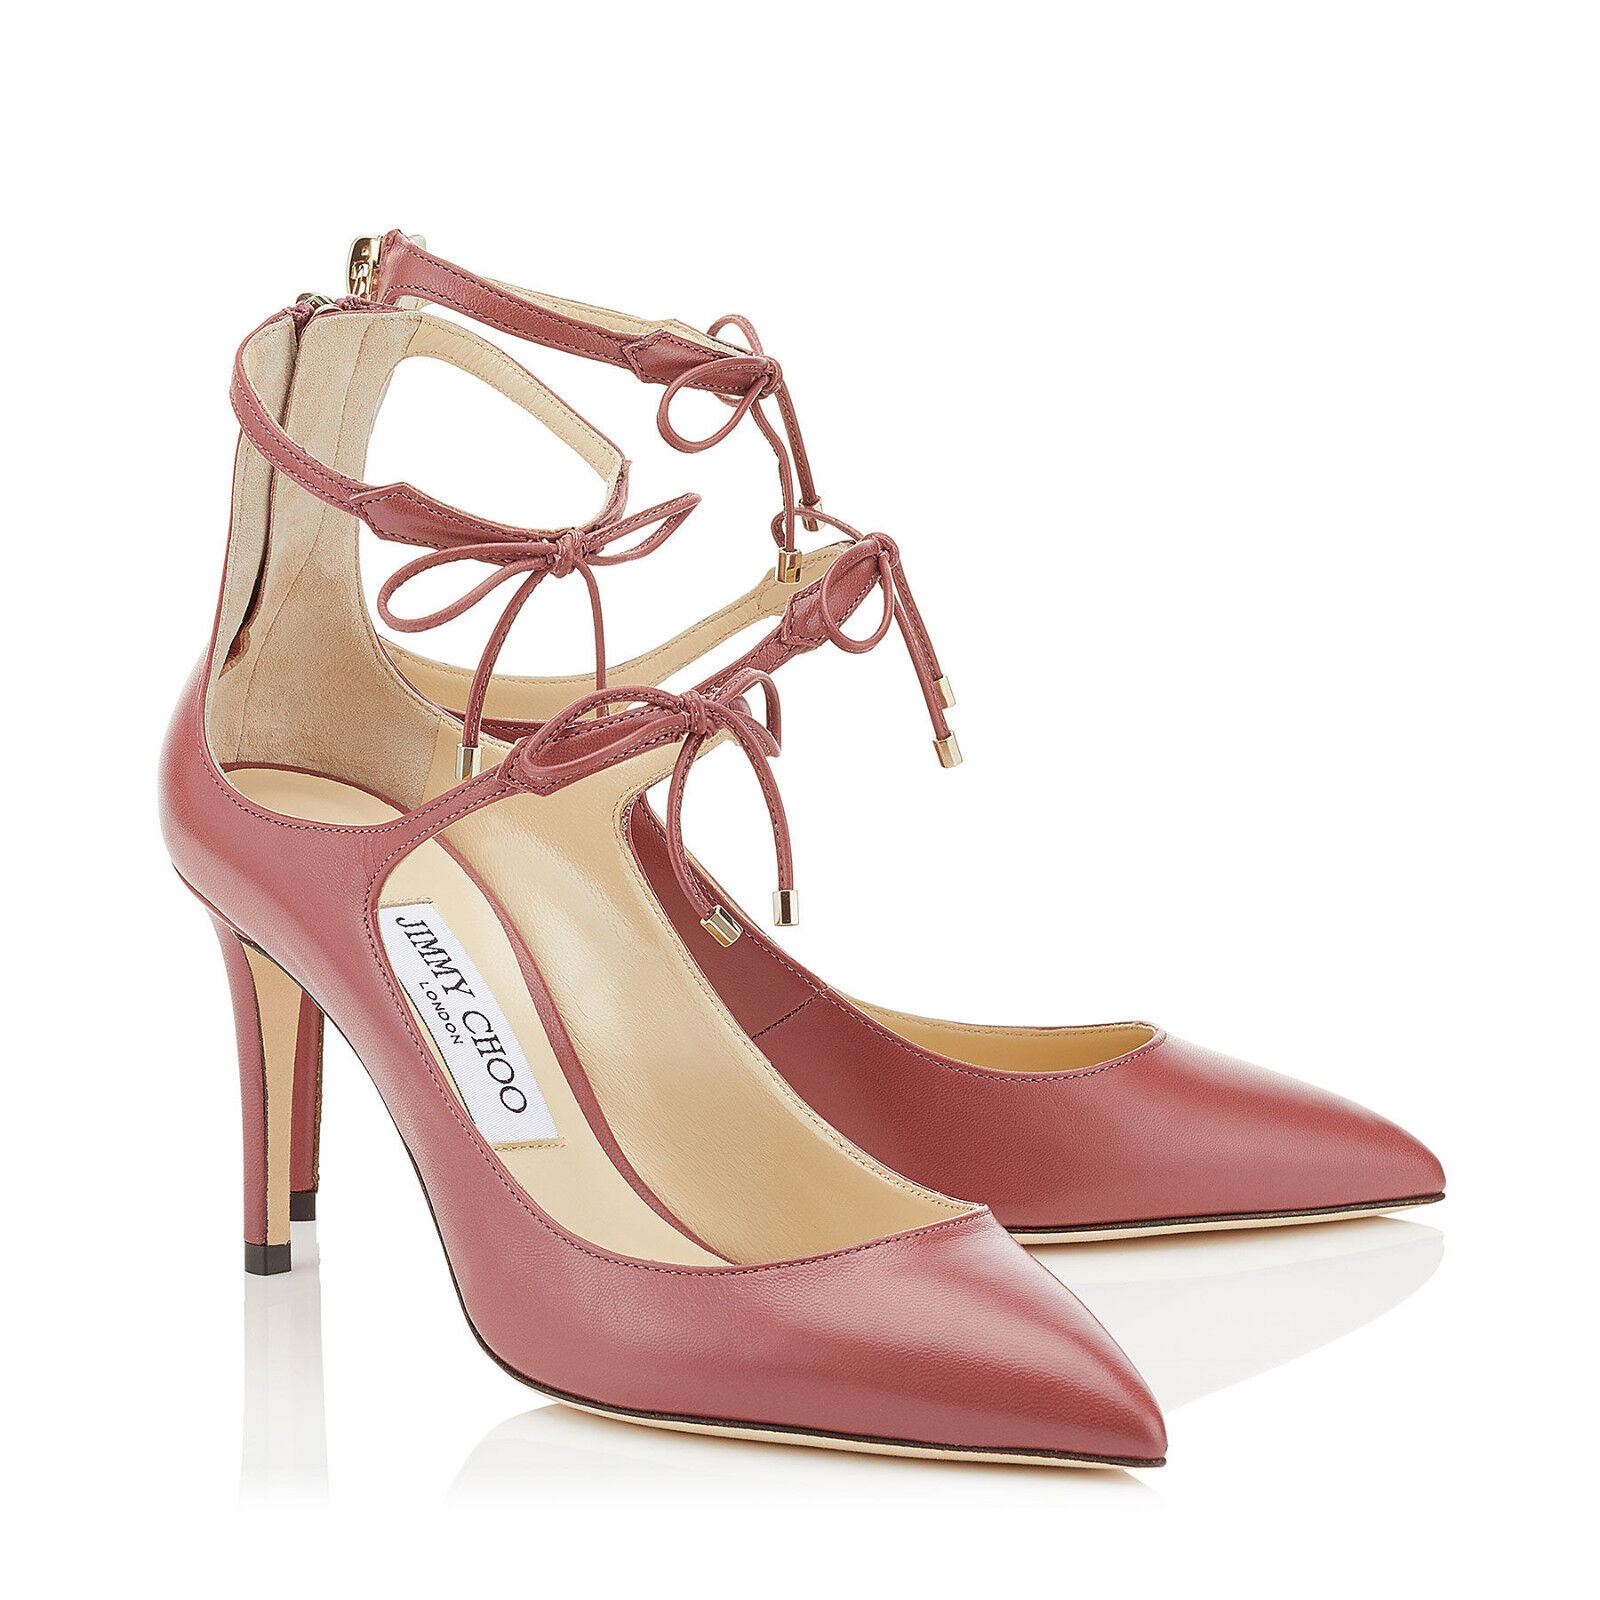 New JIMMY CHOO SAGE Size 8.5 8.5 8.5 Vintage pink Tie Front Heels Pumps shoes NIB 39 09f731